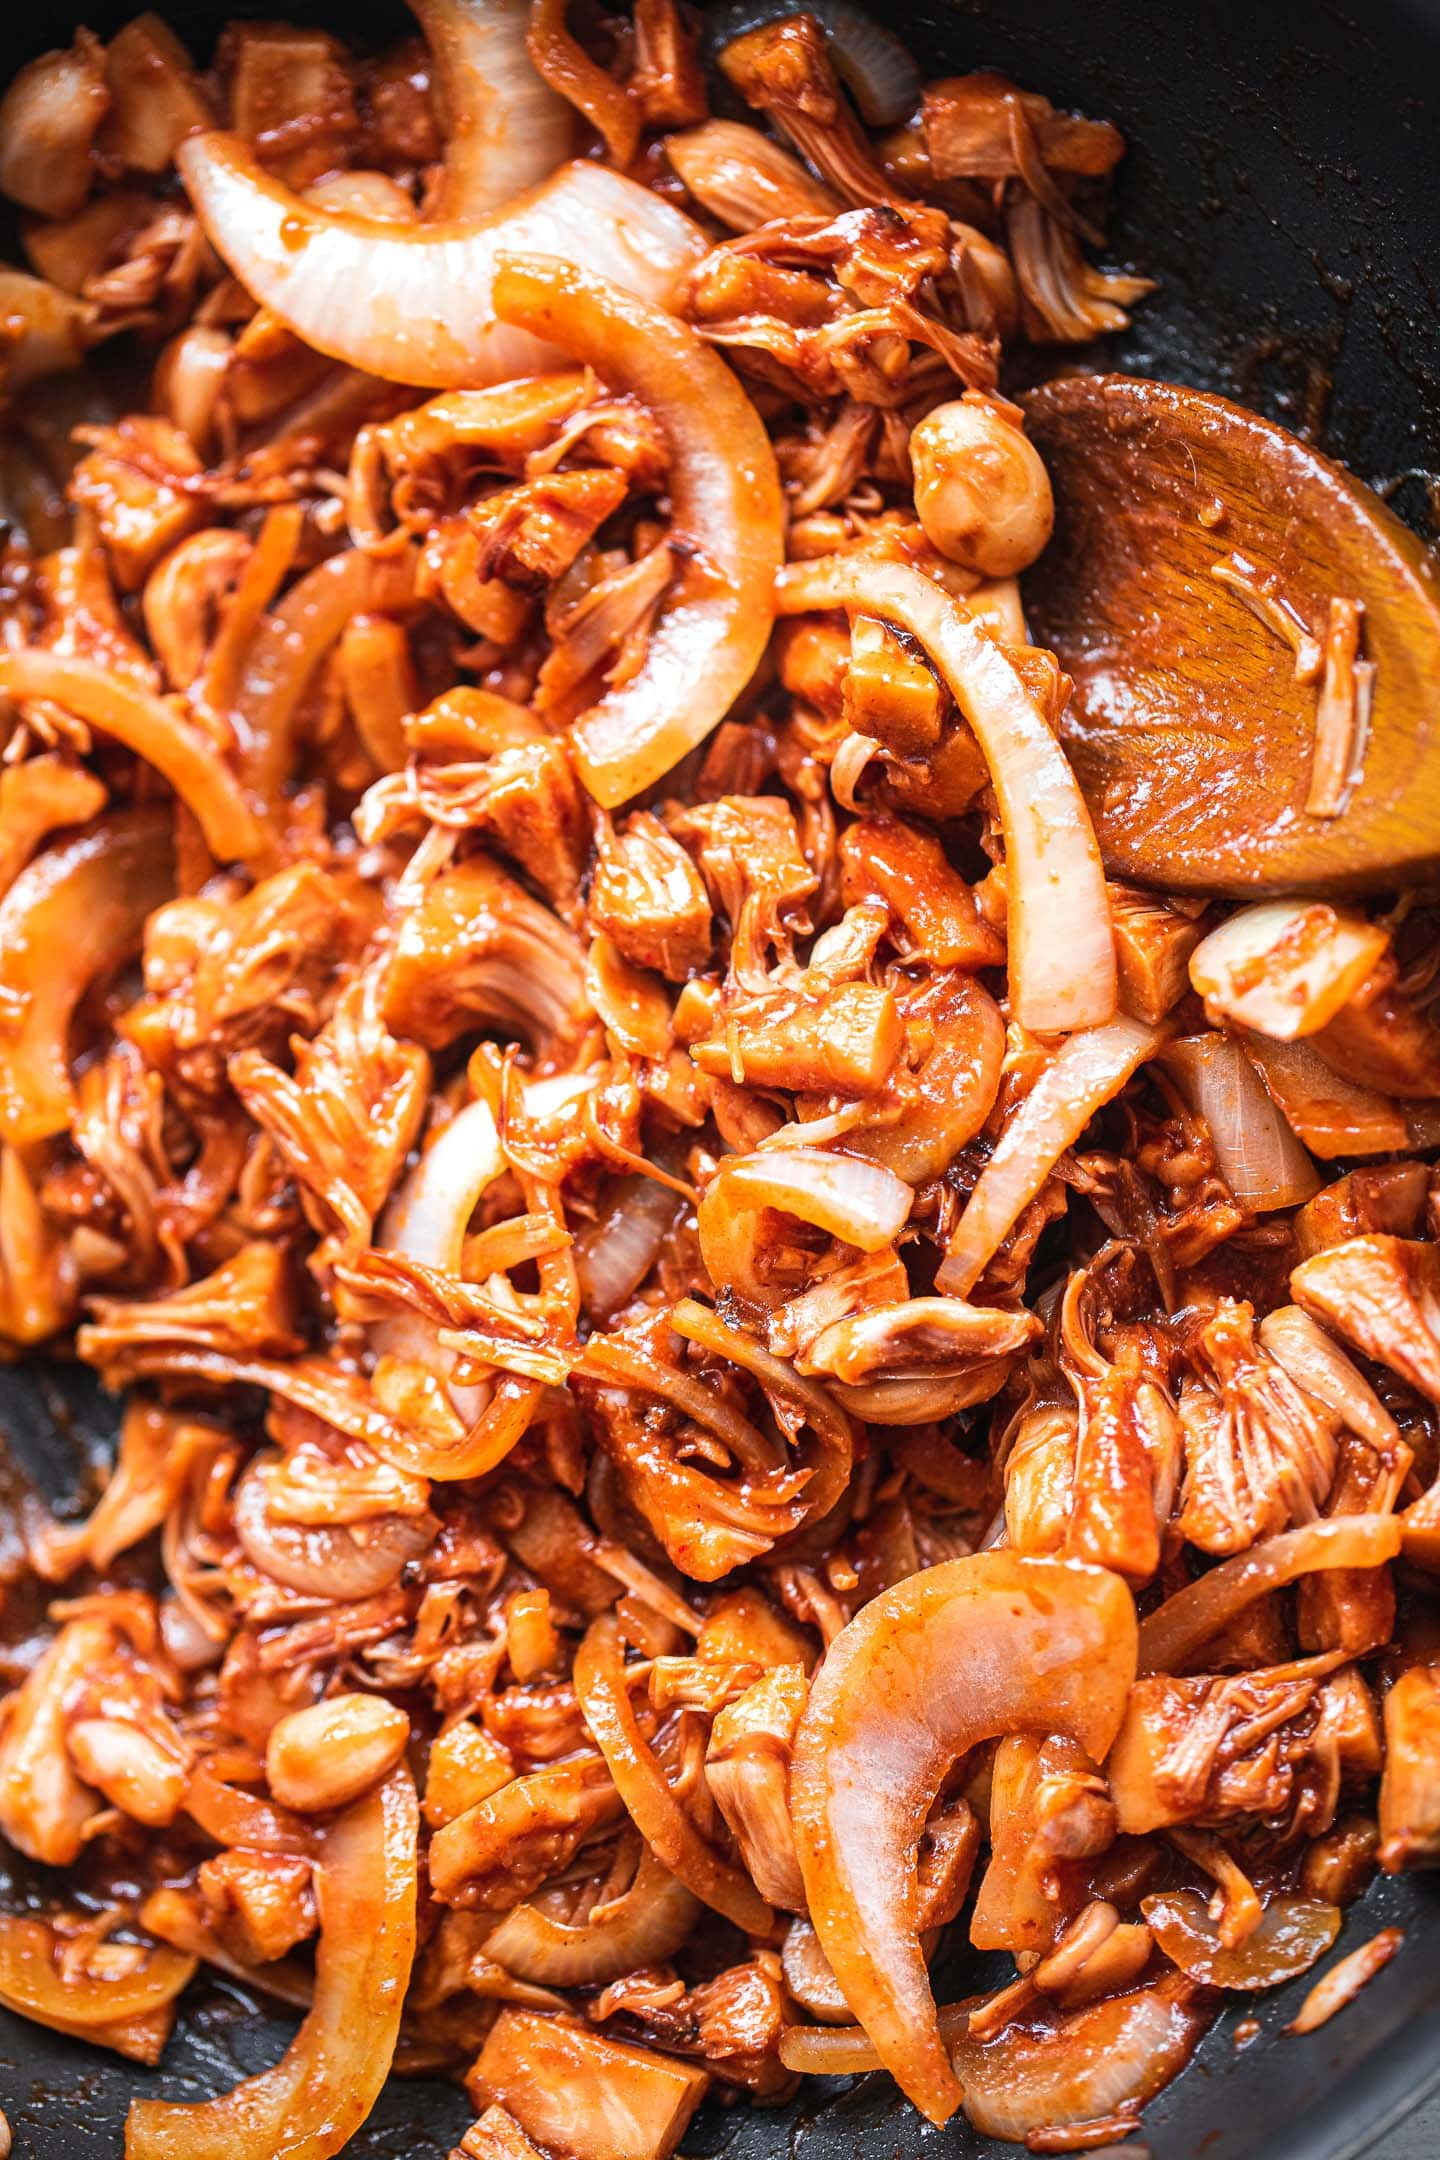 BBQ jackfruit in a pan